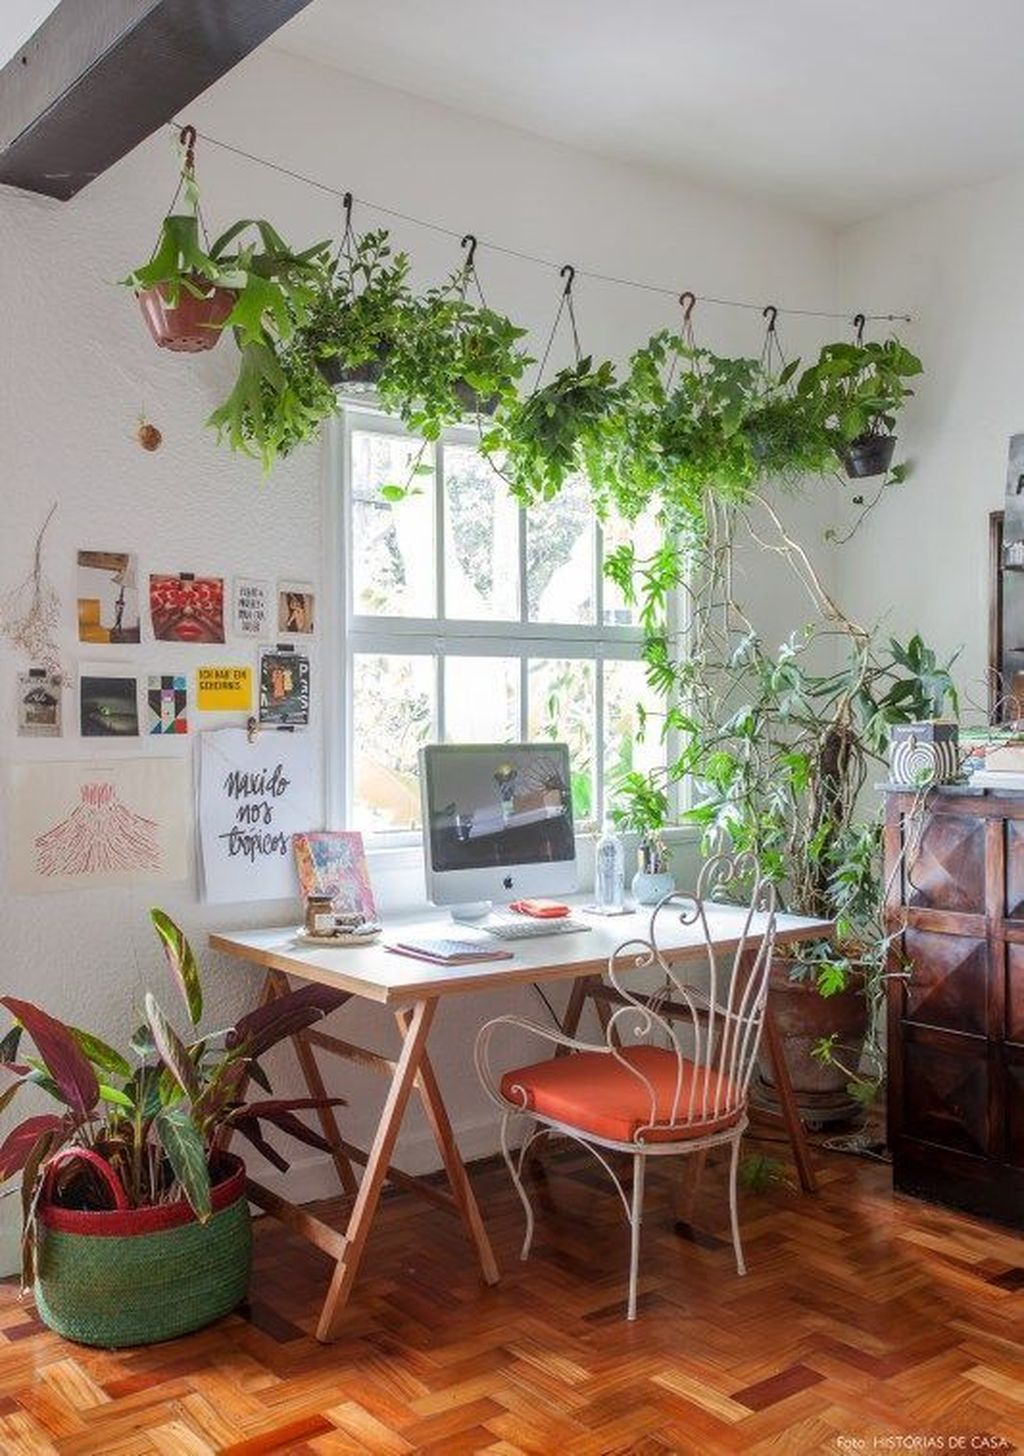 The Best Indoor Garden Ideas To Beautify Your Home 24